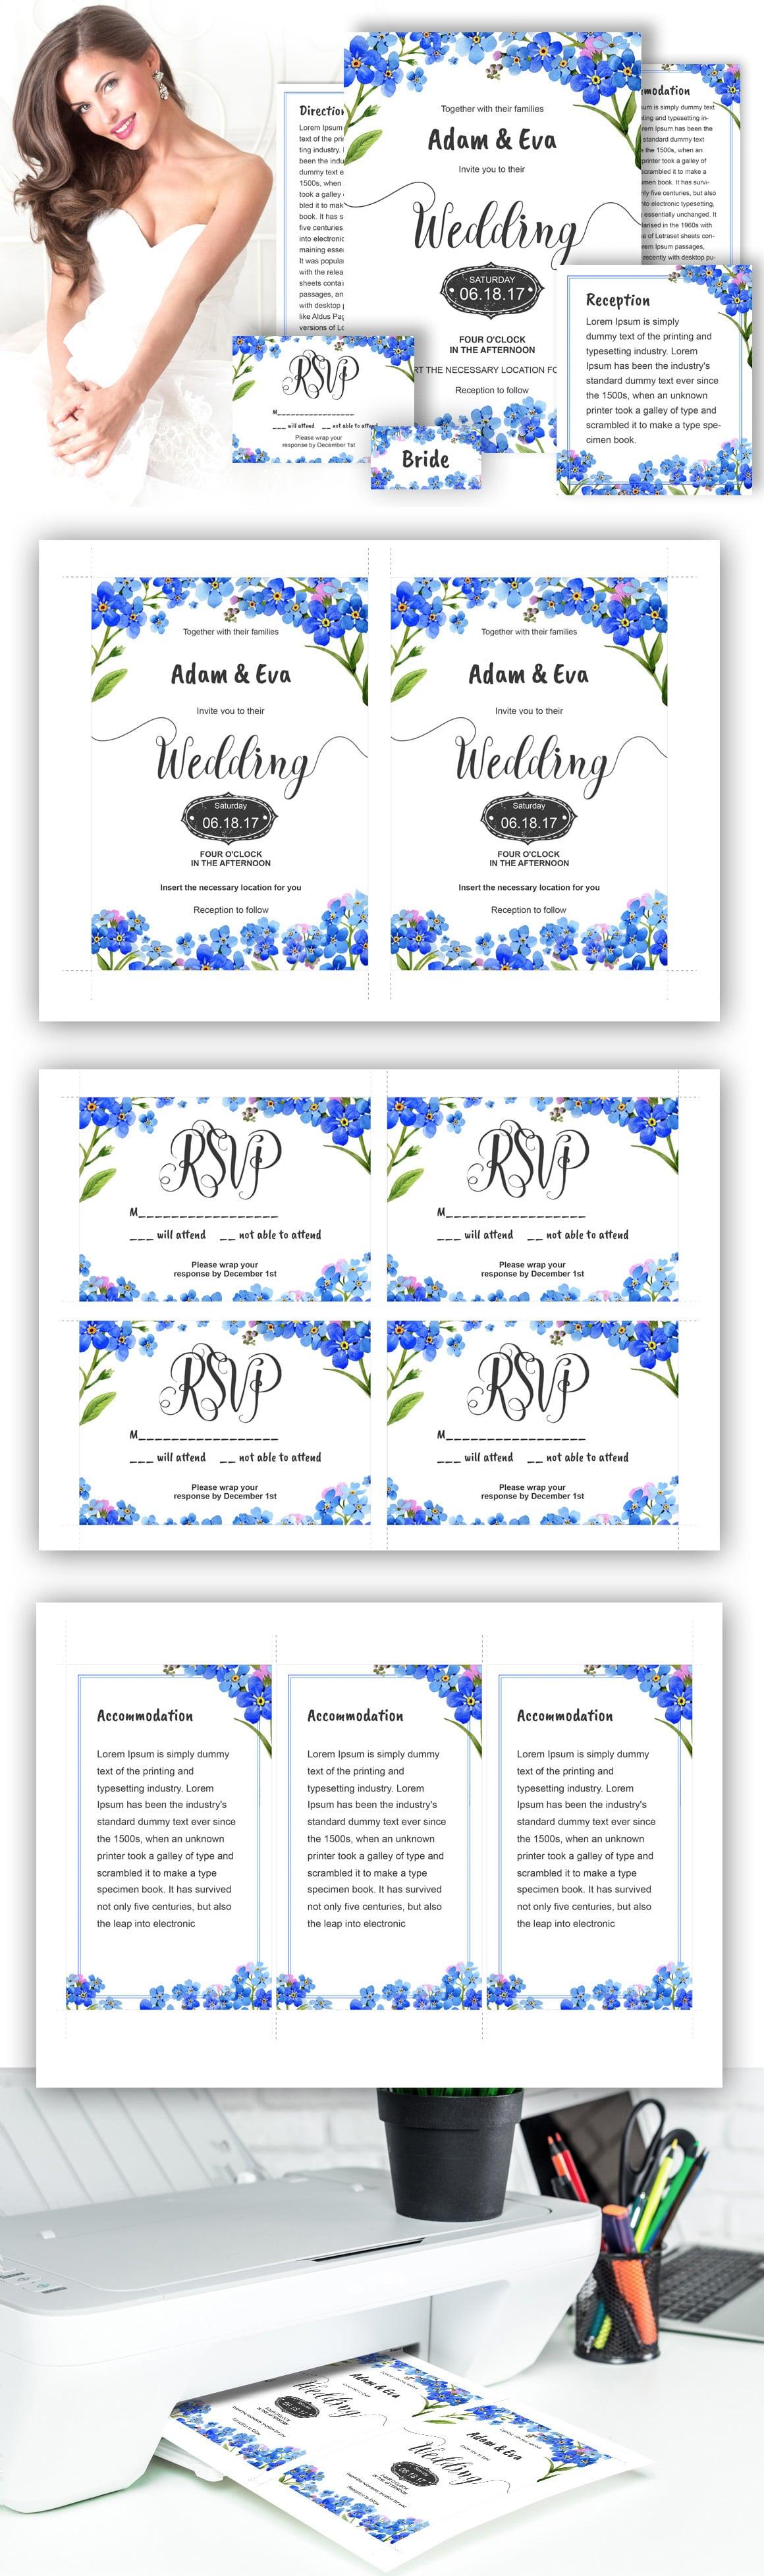 Myosotis flowers PNG watercolor set